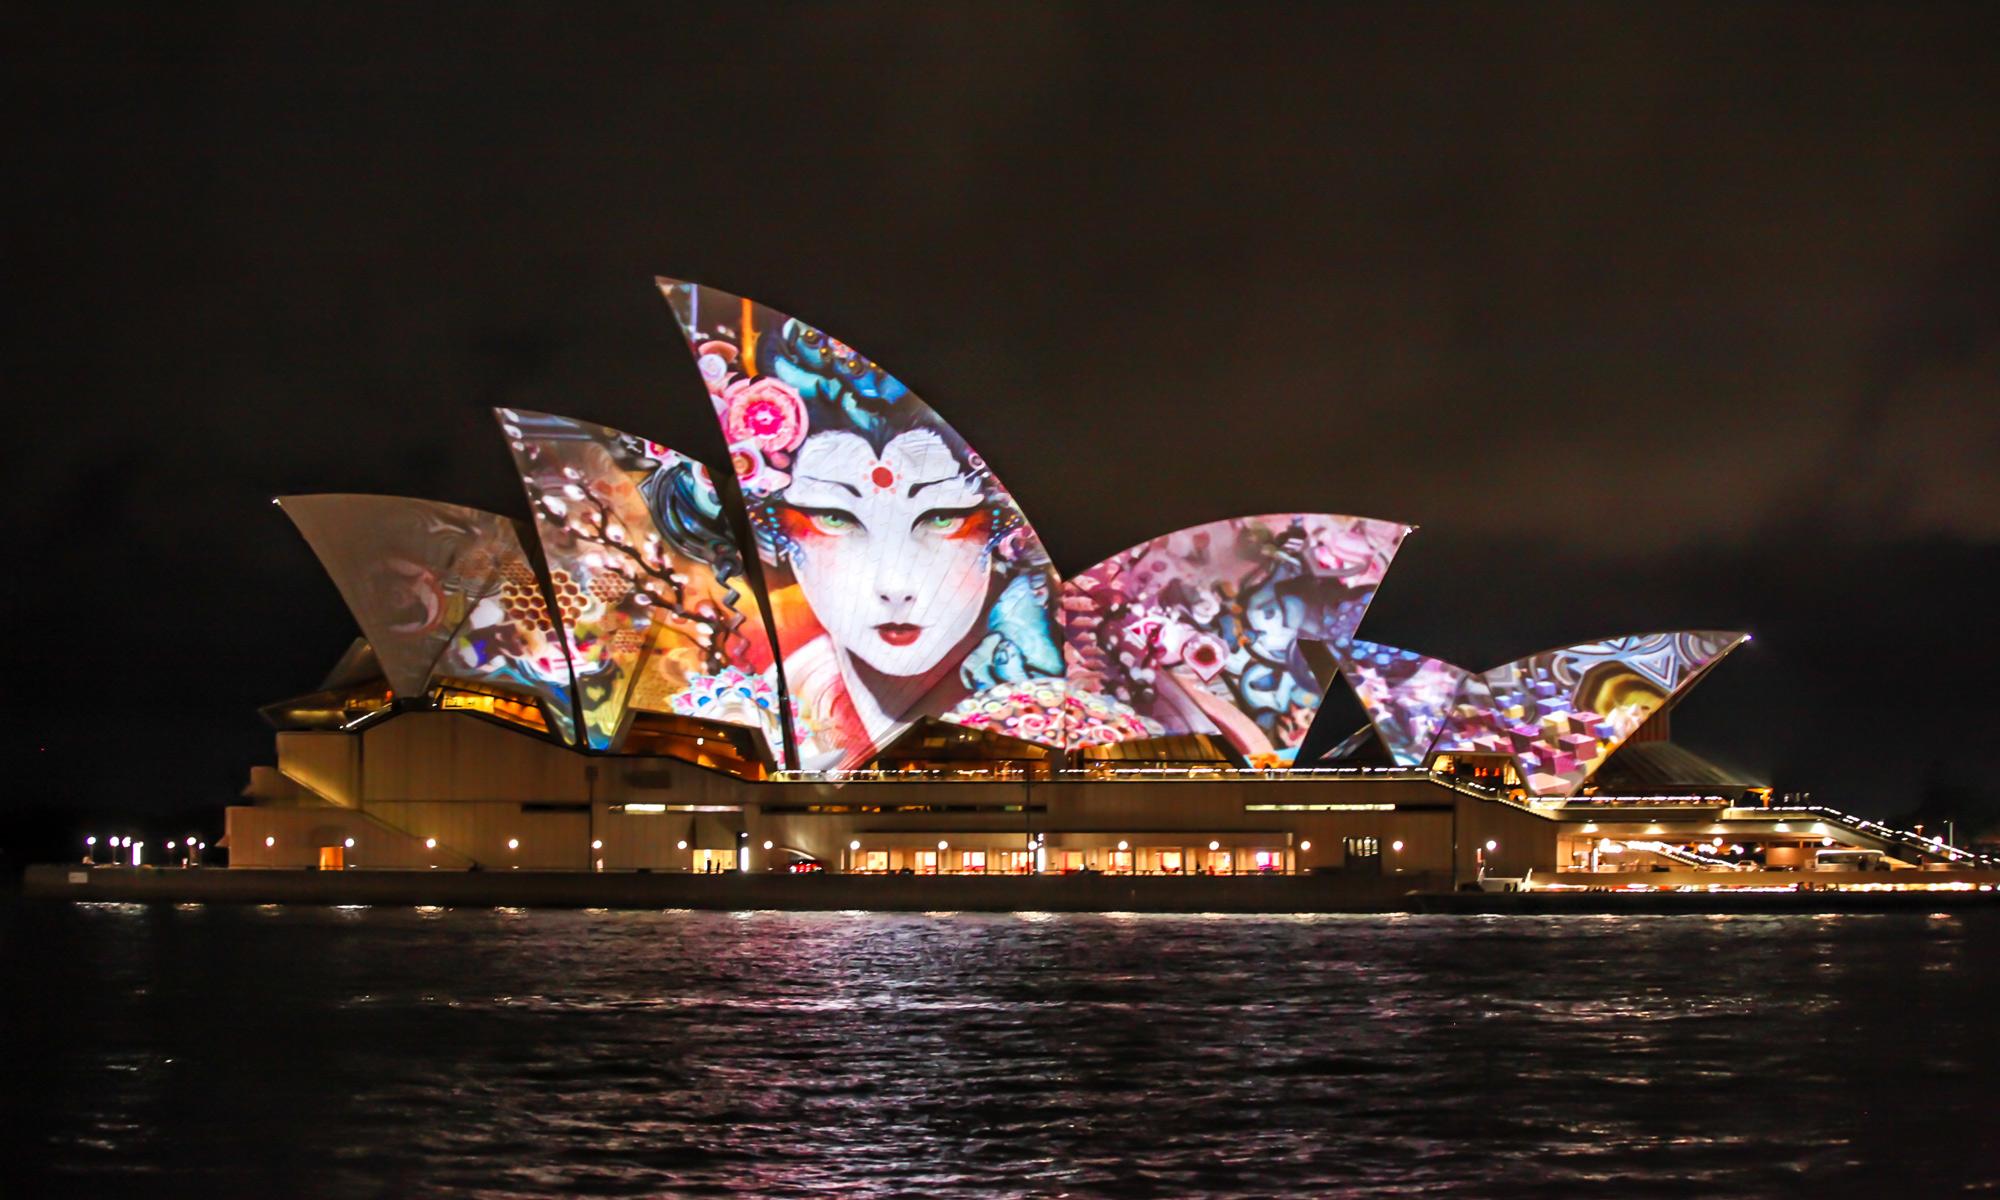 Threlkel's projections on the Sydney Opera House. Photo: Joshua Brott